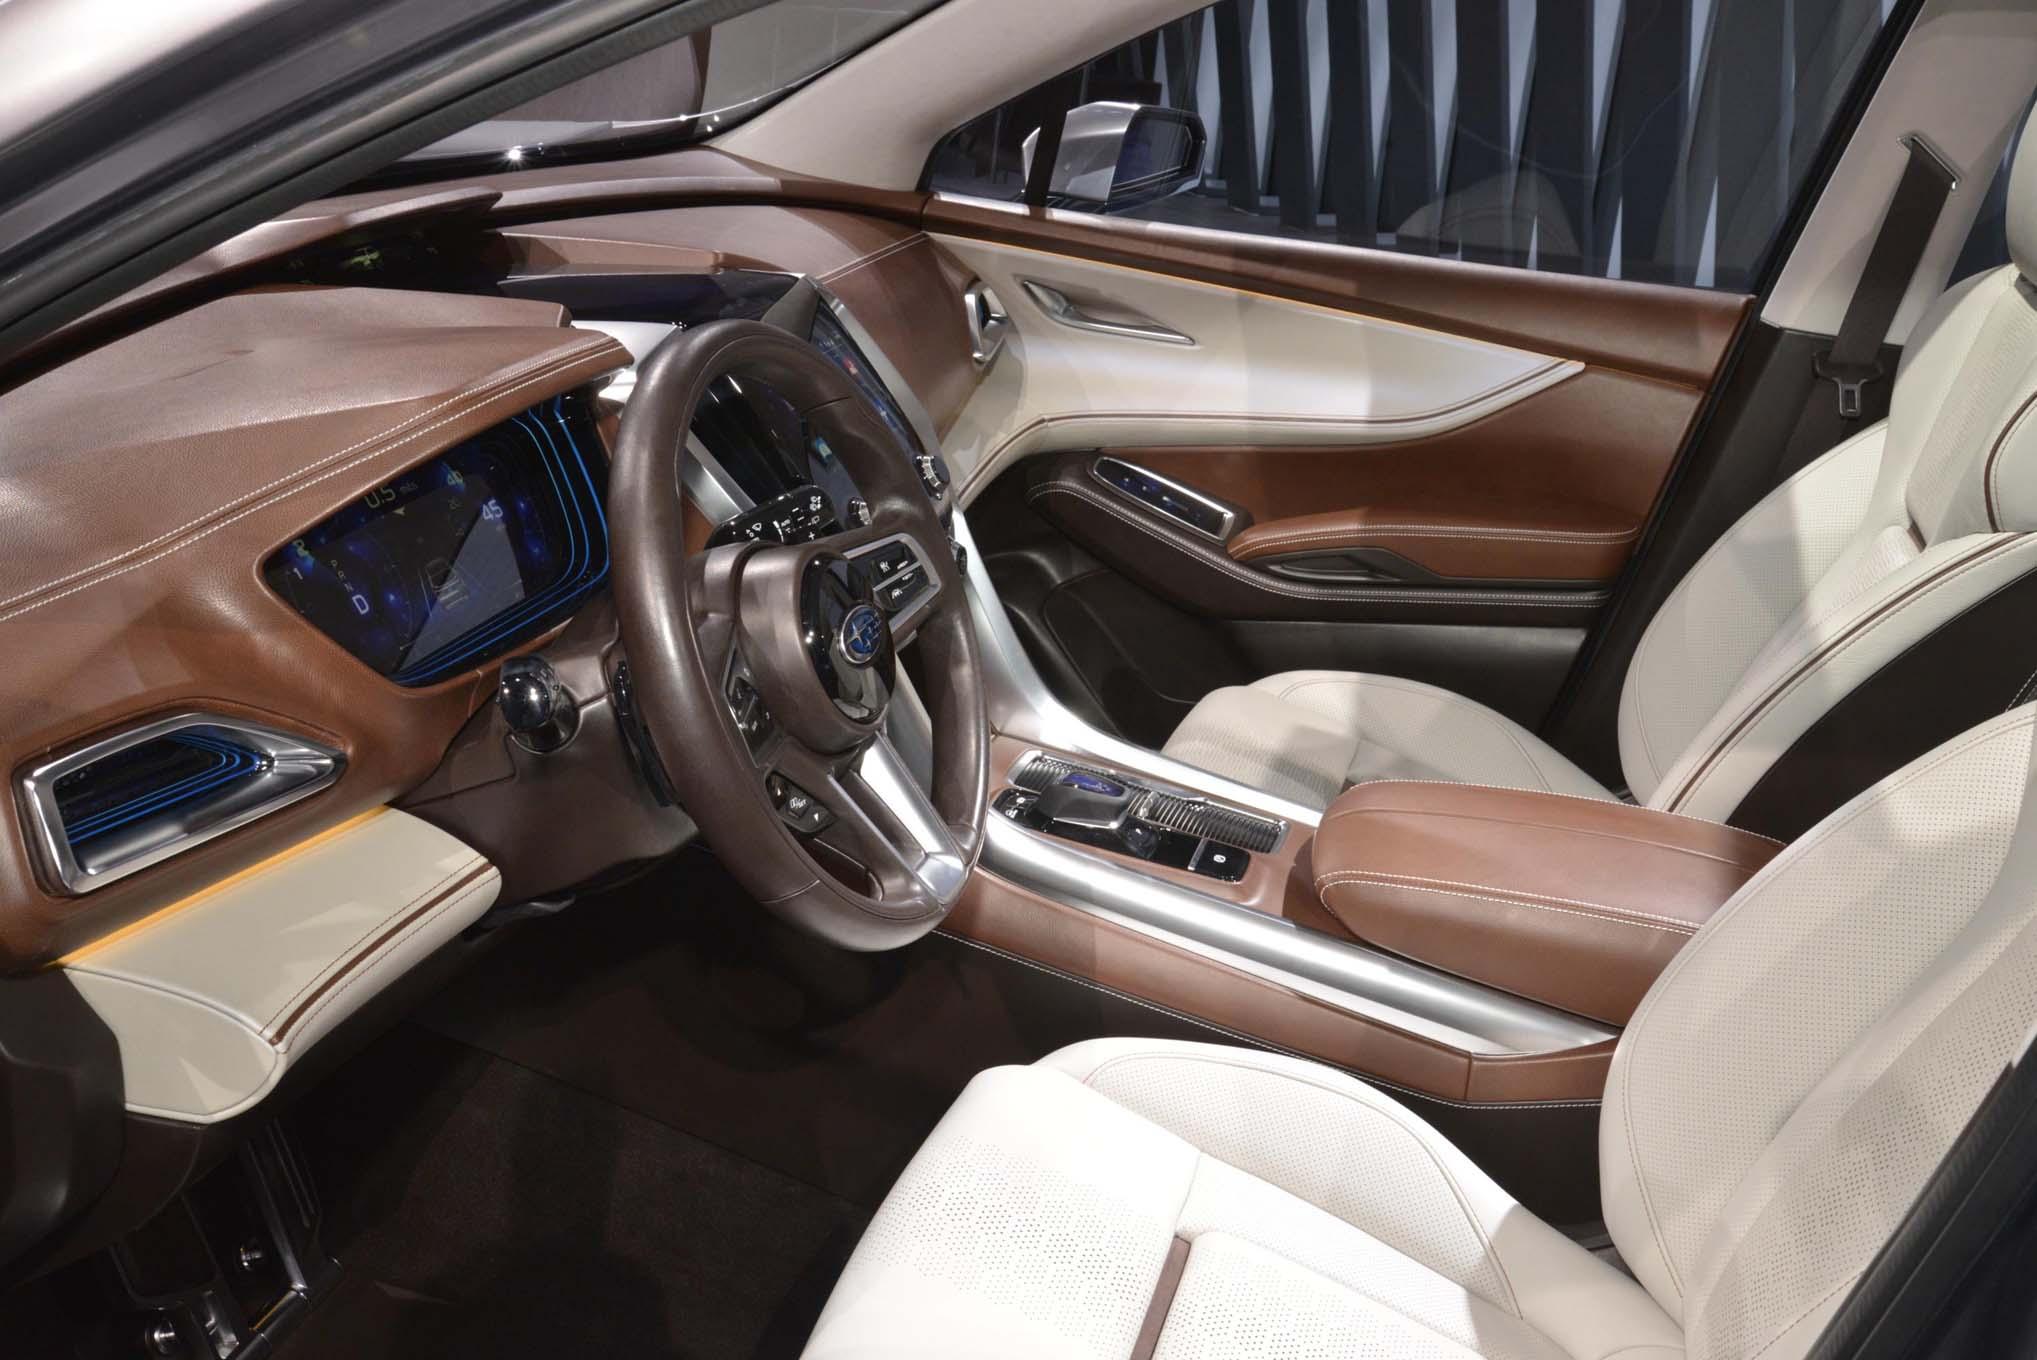 Subaru Legacy 3.6 R >> Subaru Ascent SUV Concept Aims to Help Spread the Love ...